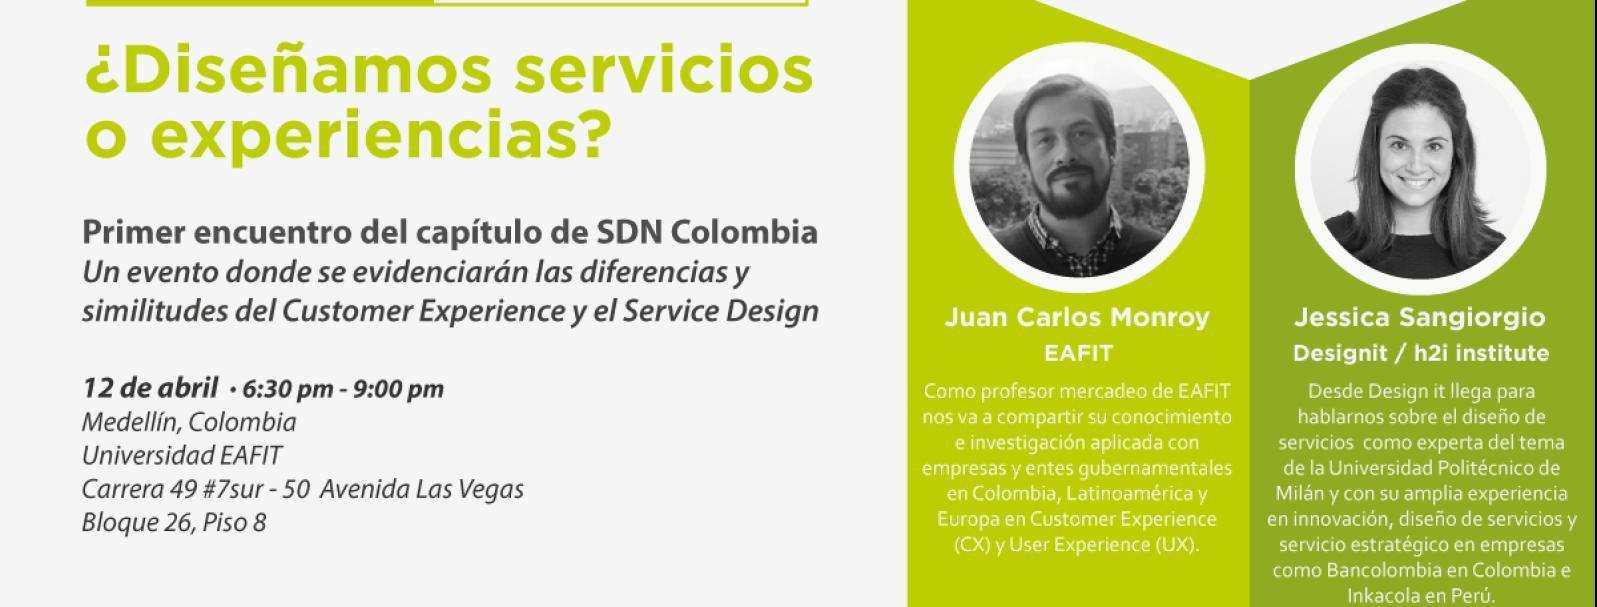 ¿Diseñamos Servicios o experiencias?